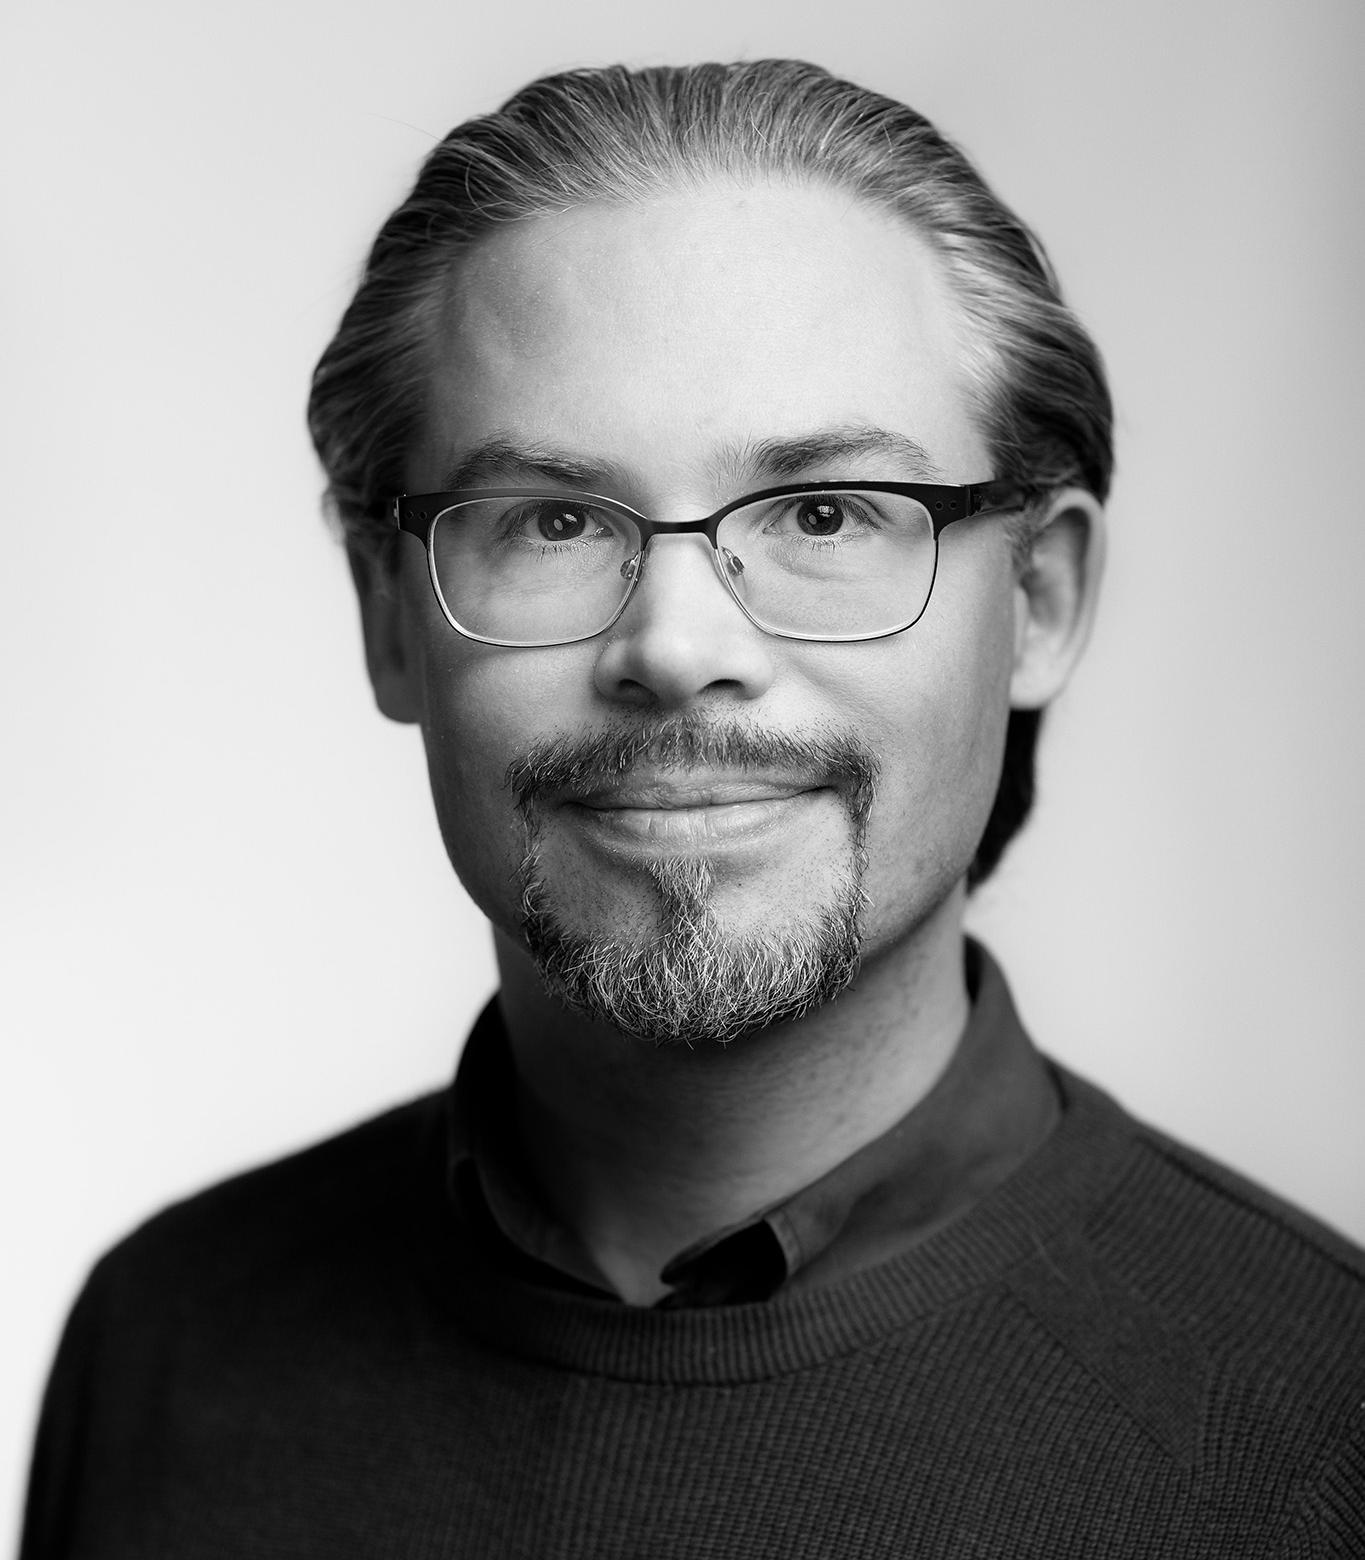 Jon Edlund